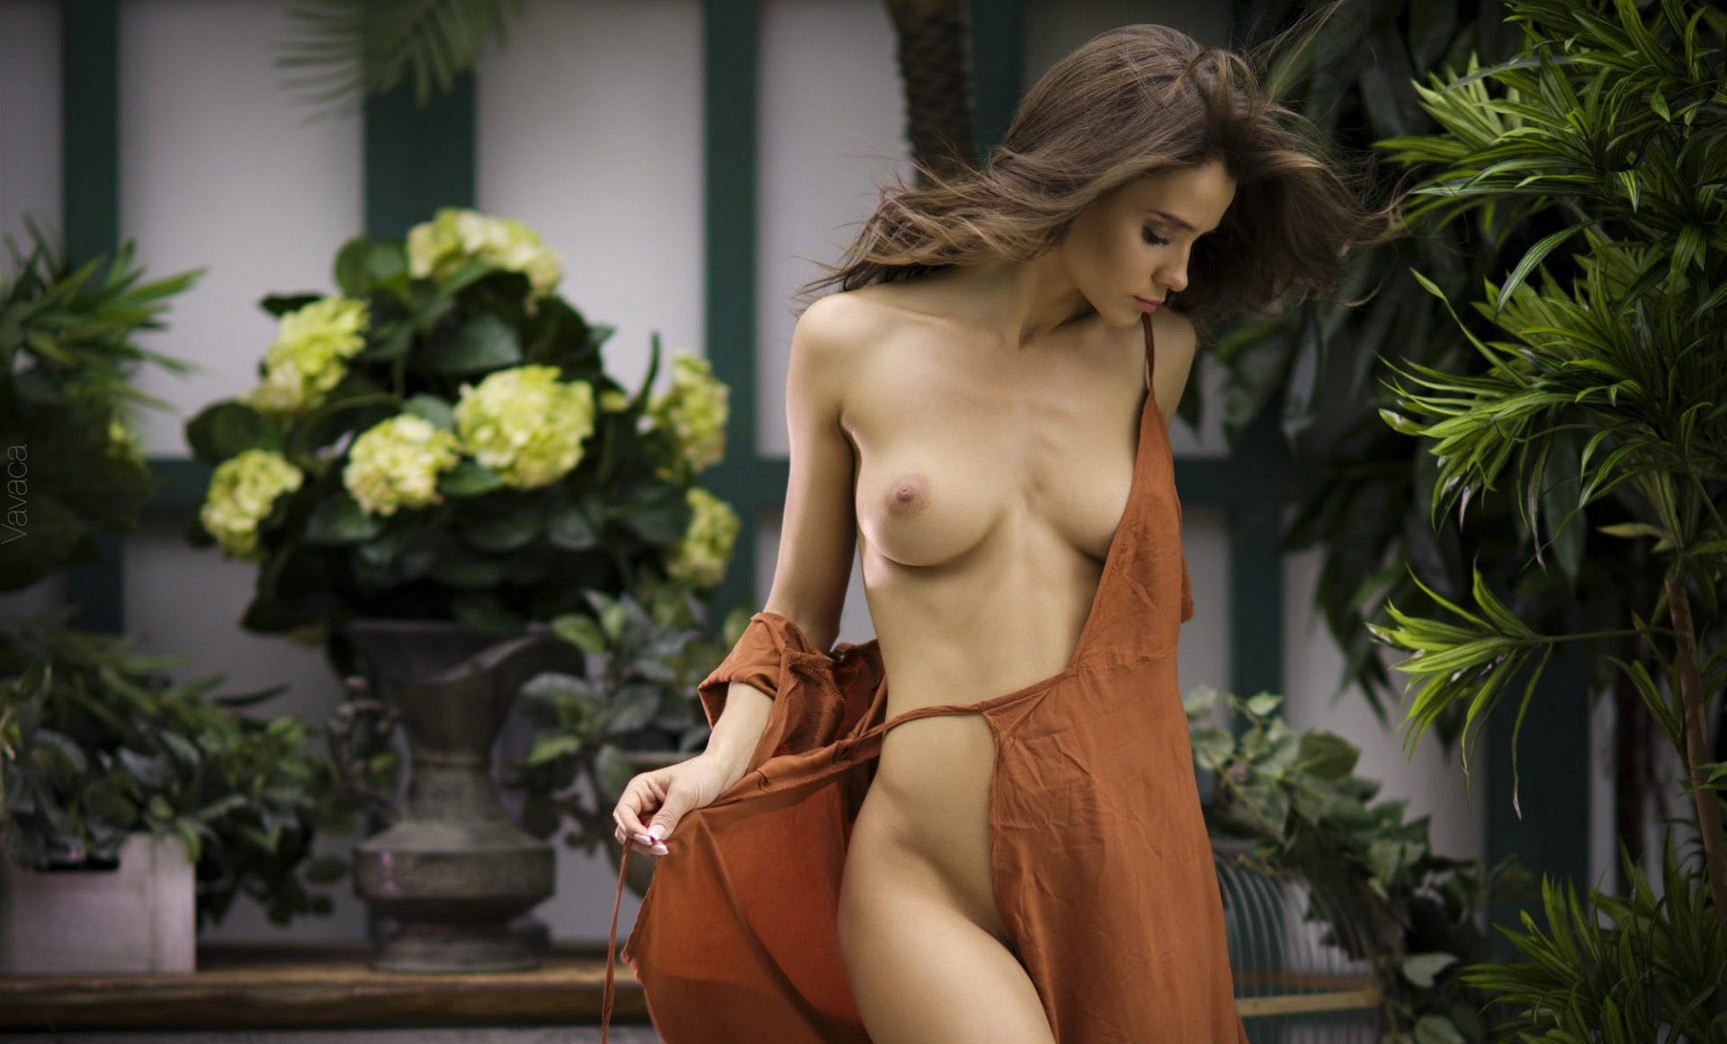 финалистка конкурса Miss Maxim Кристина Макарова / Kristina Makarova nude by Vladimir Nikolaev